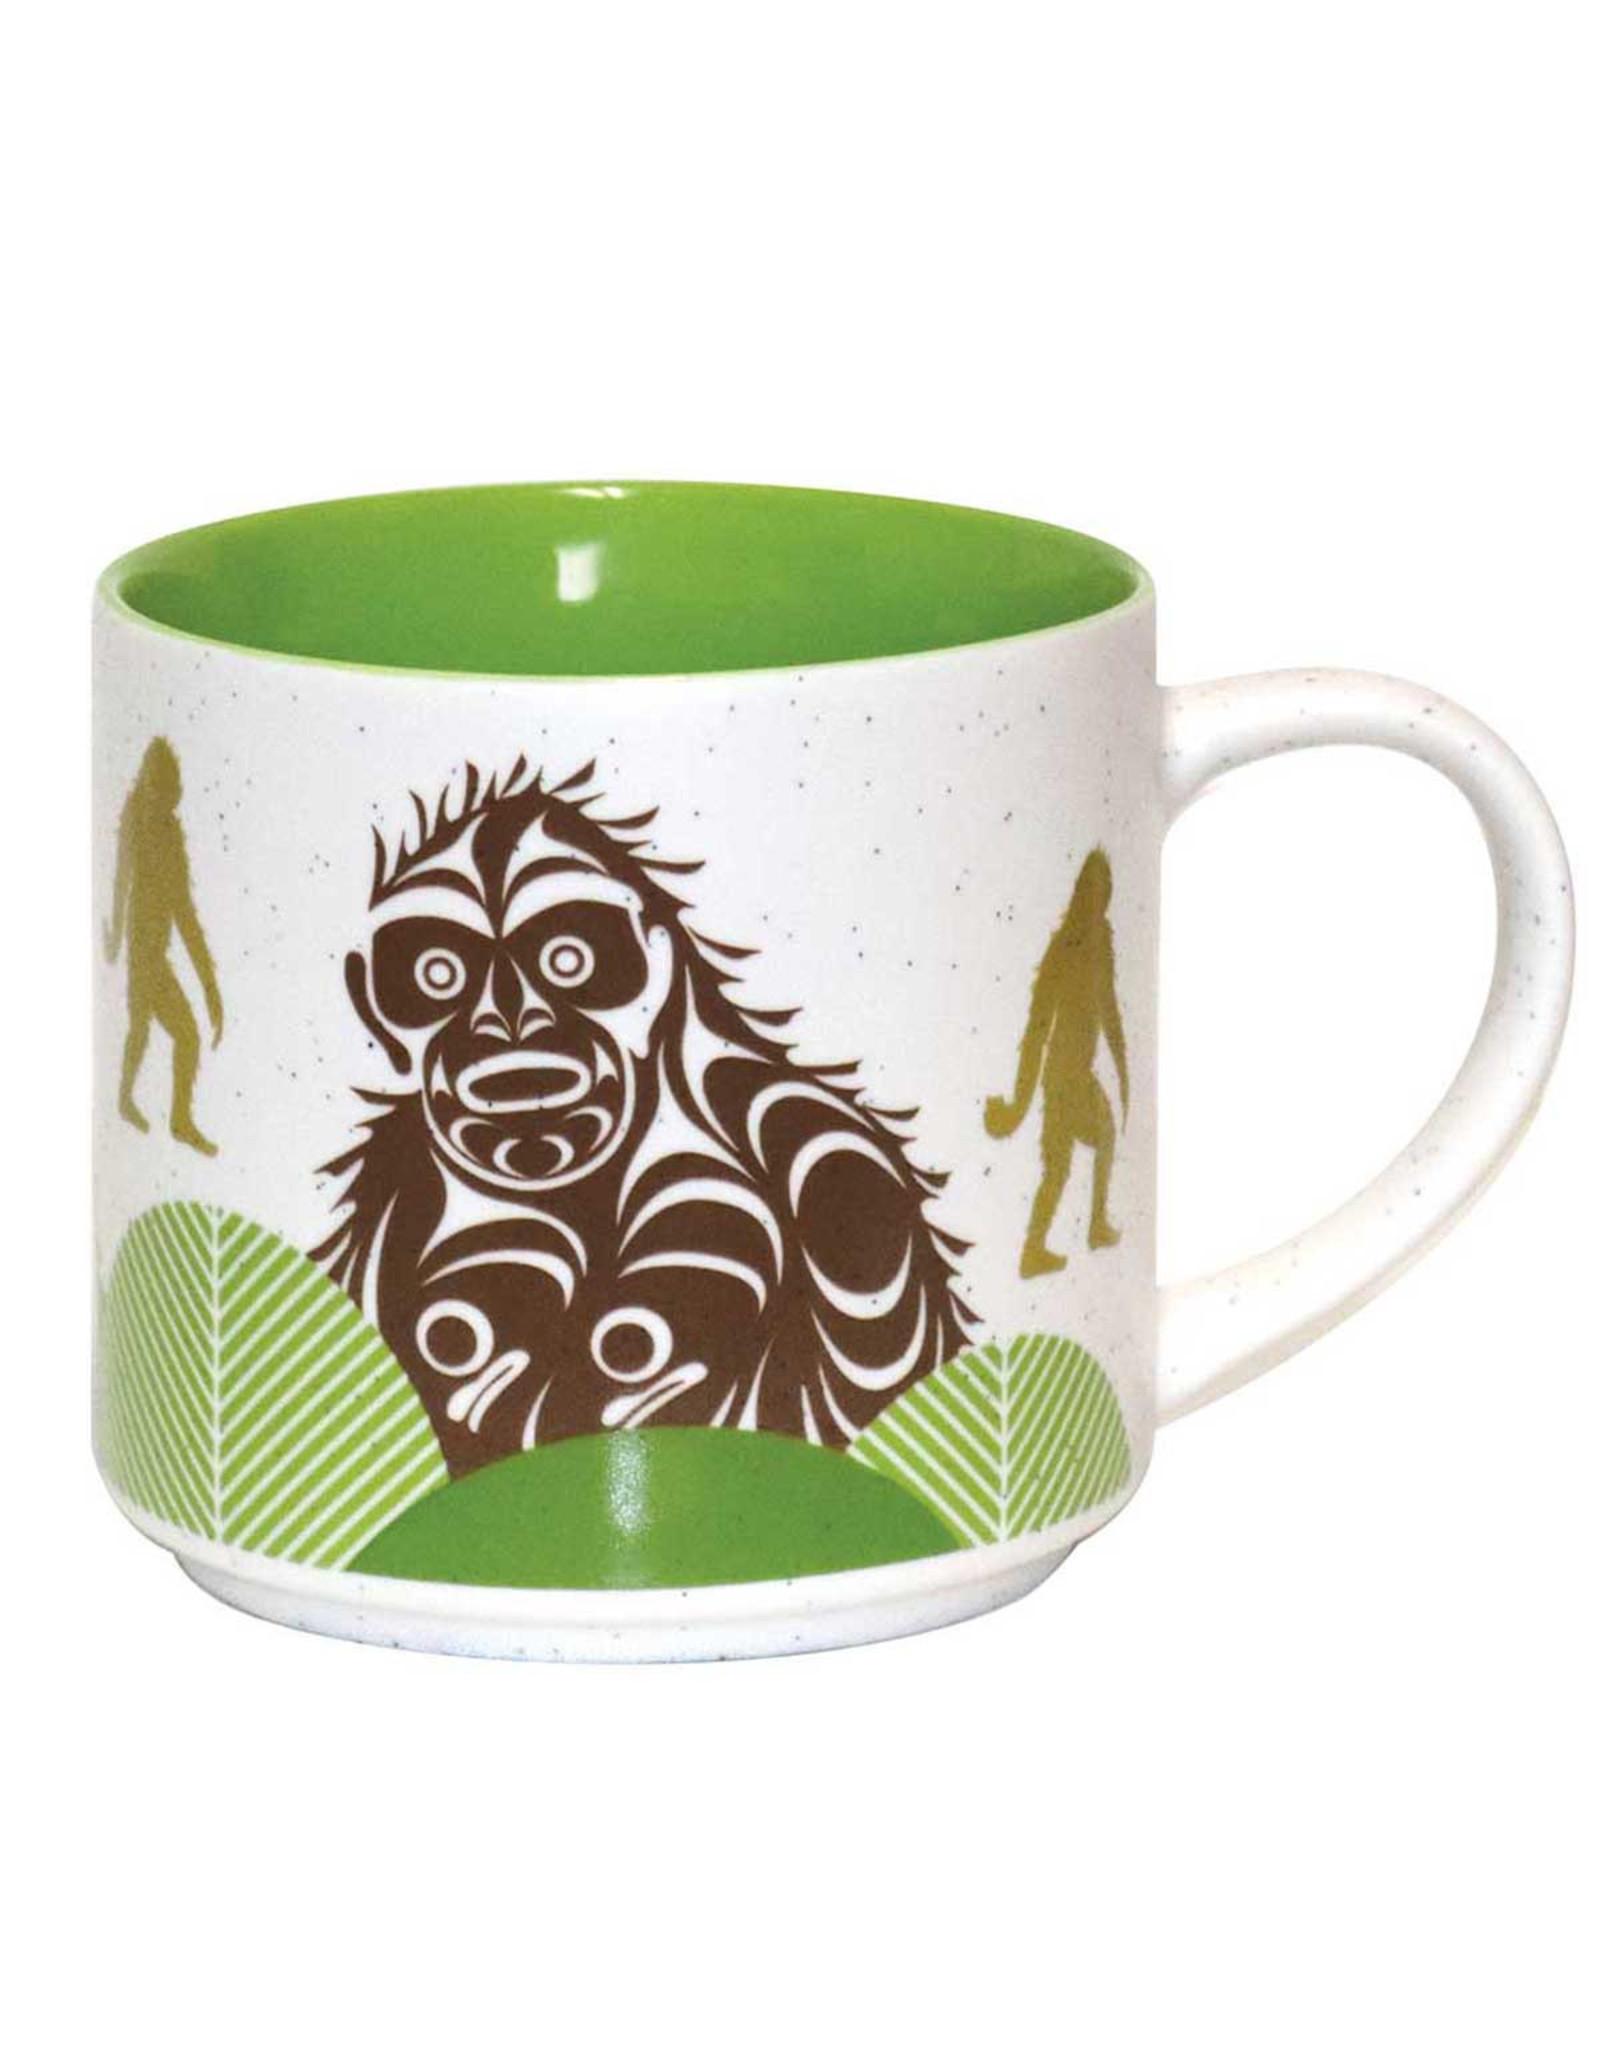 Ceramic Mug - Sasquatch (CMUG12)